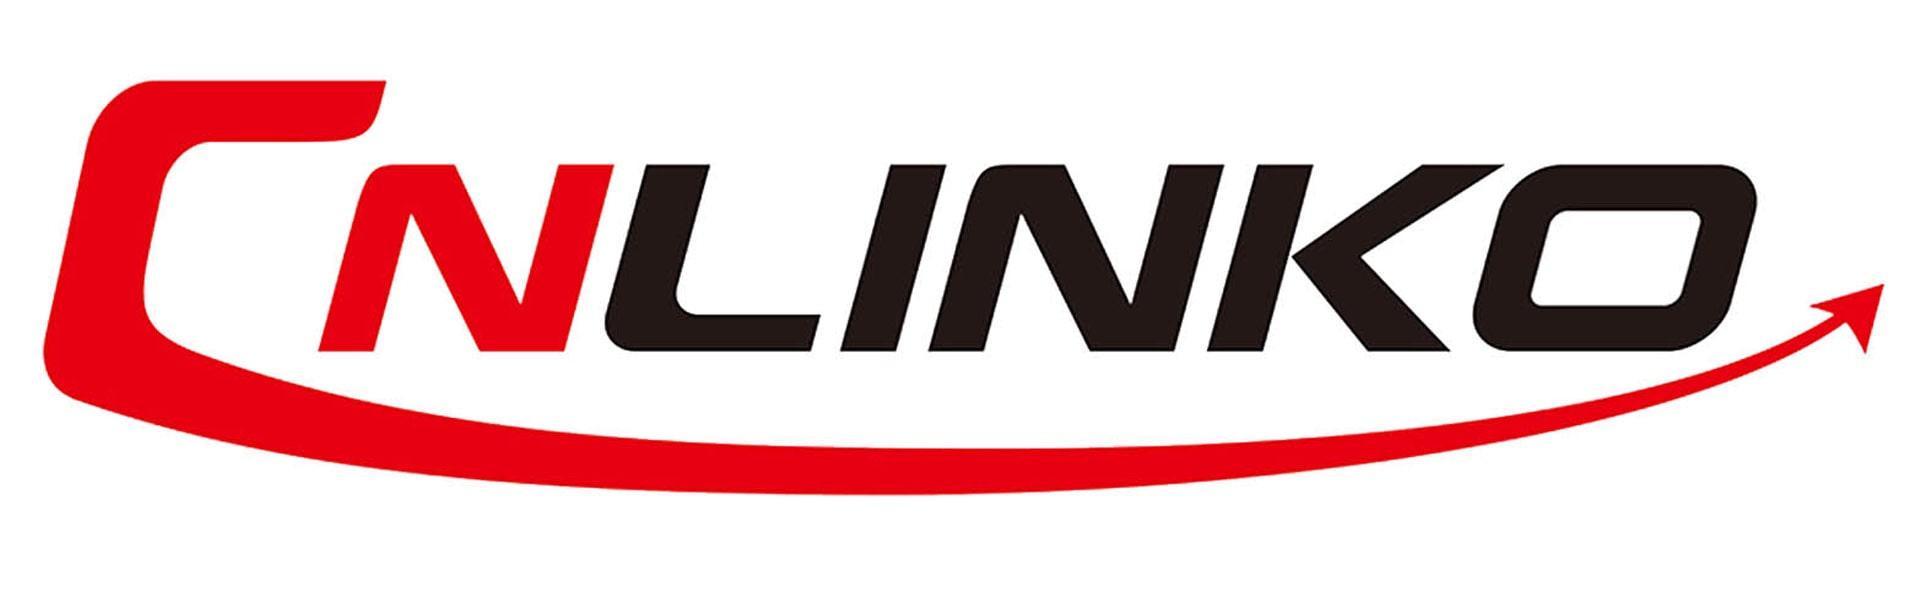 CNLINKO-LOGO-BRAND